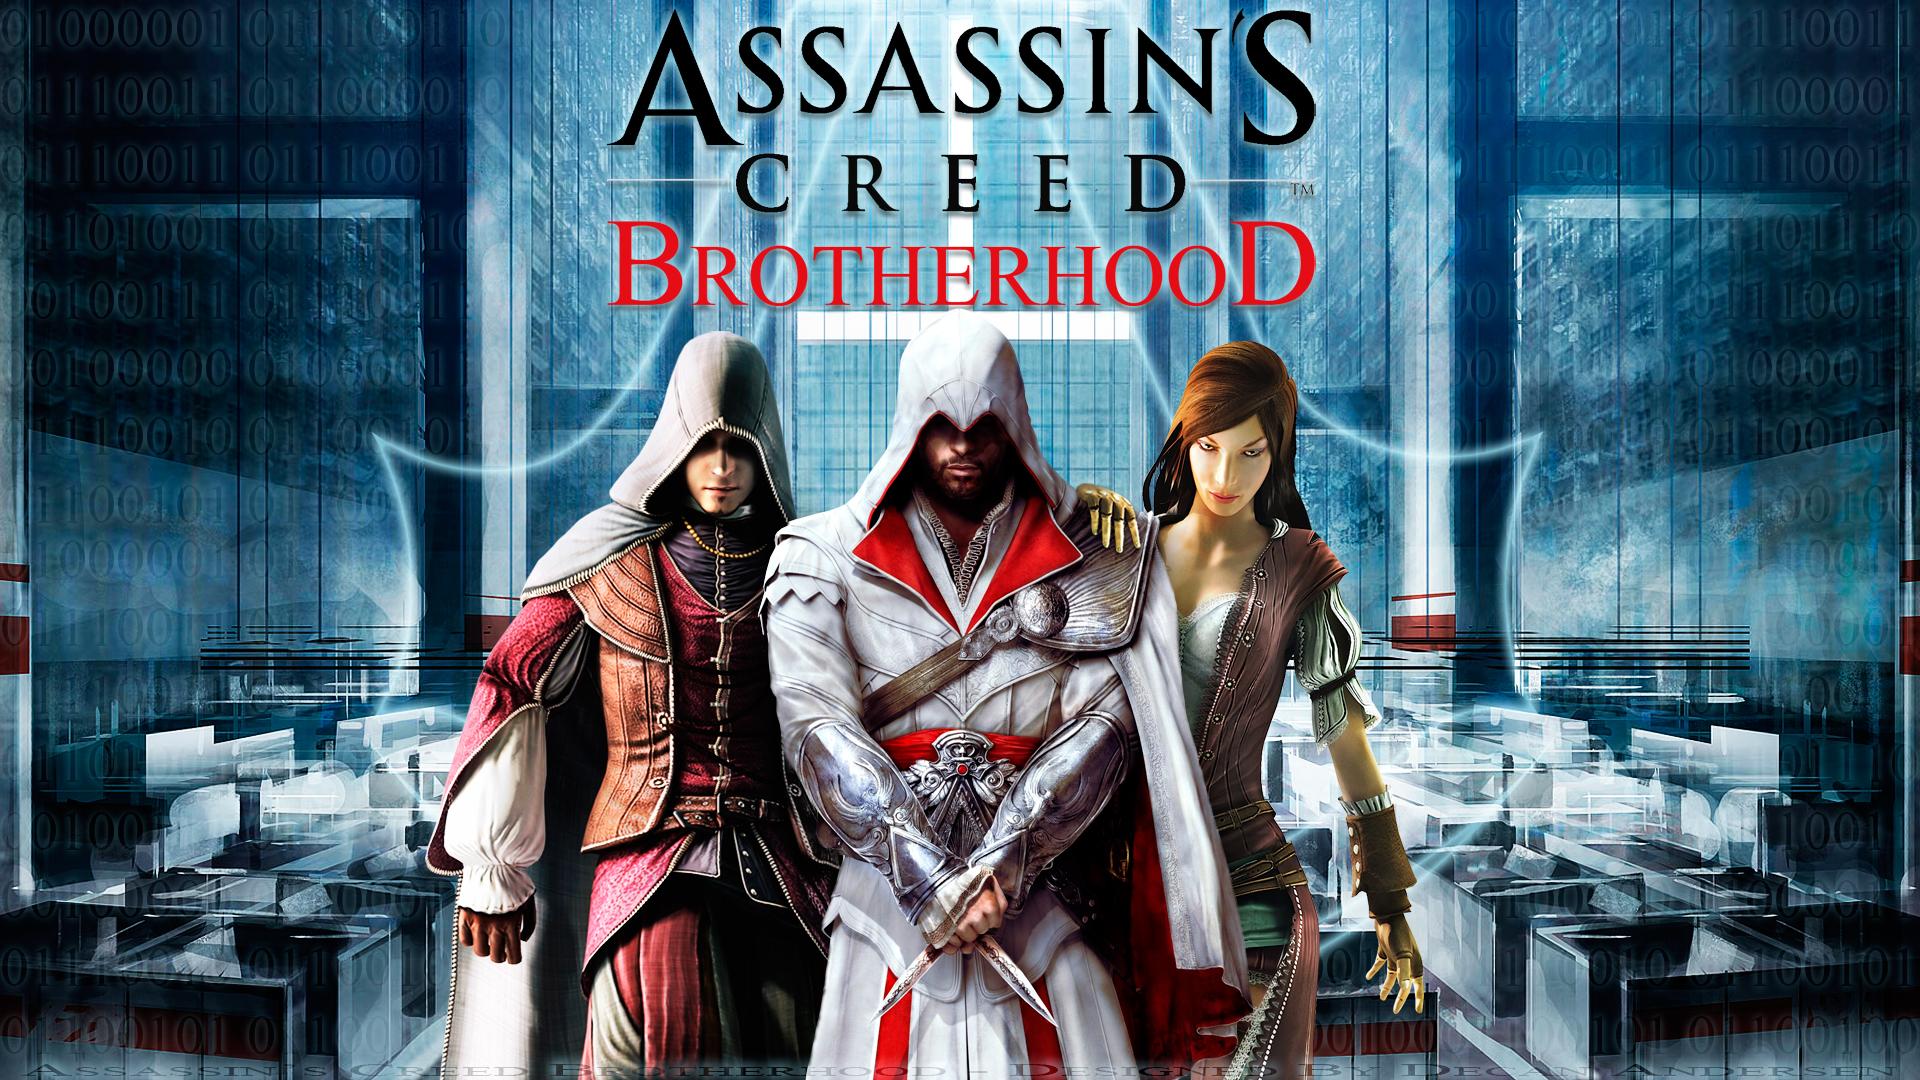 Assassins Creed Brotherhood wallpaper   278337 1920x1080